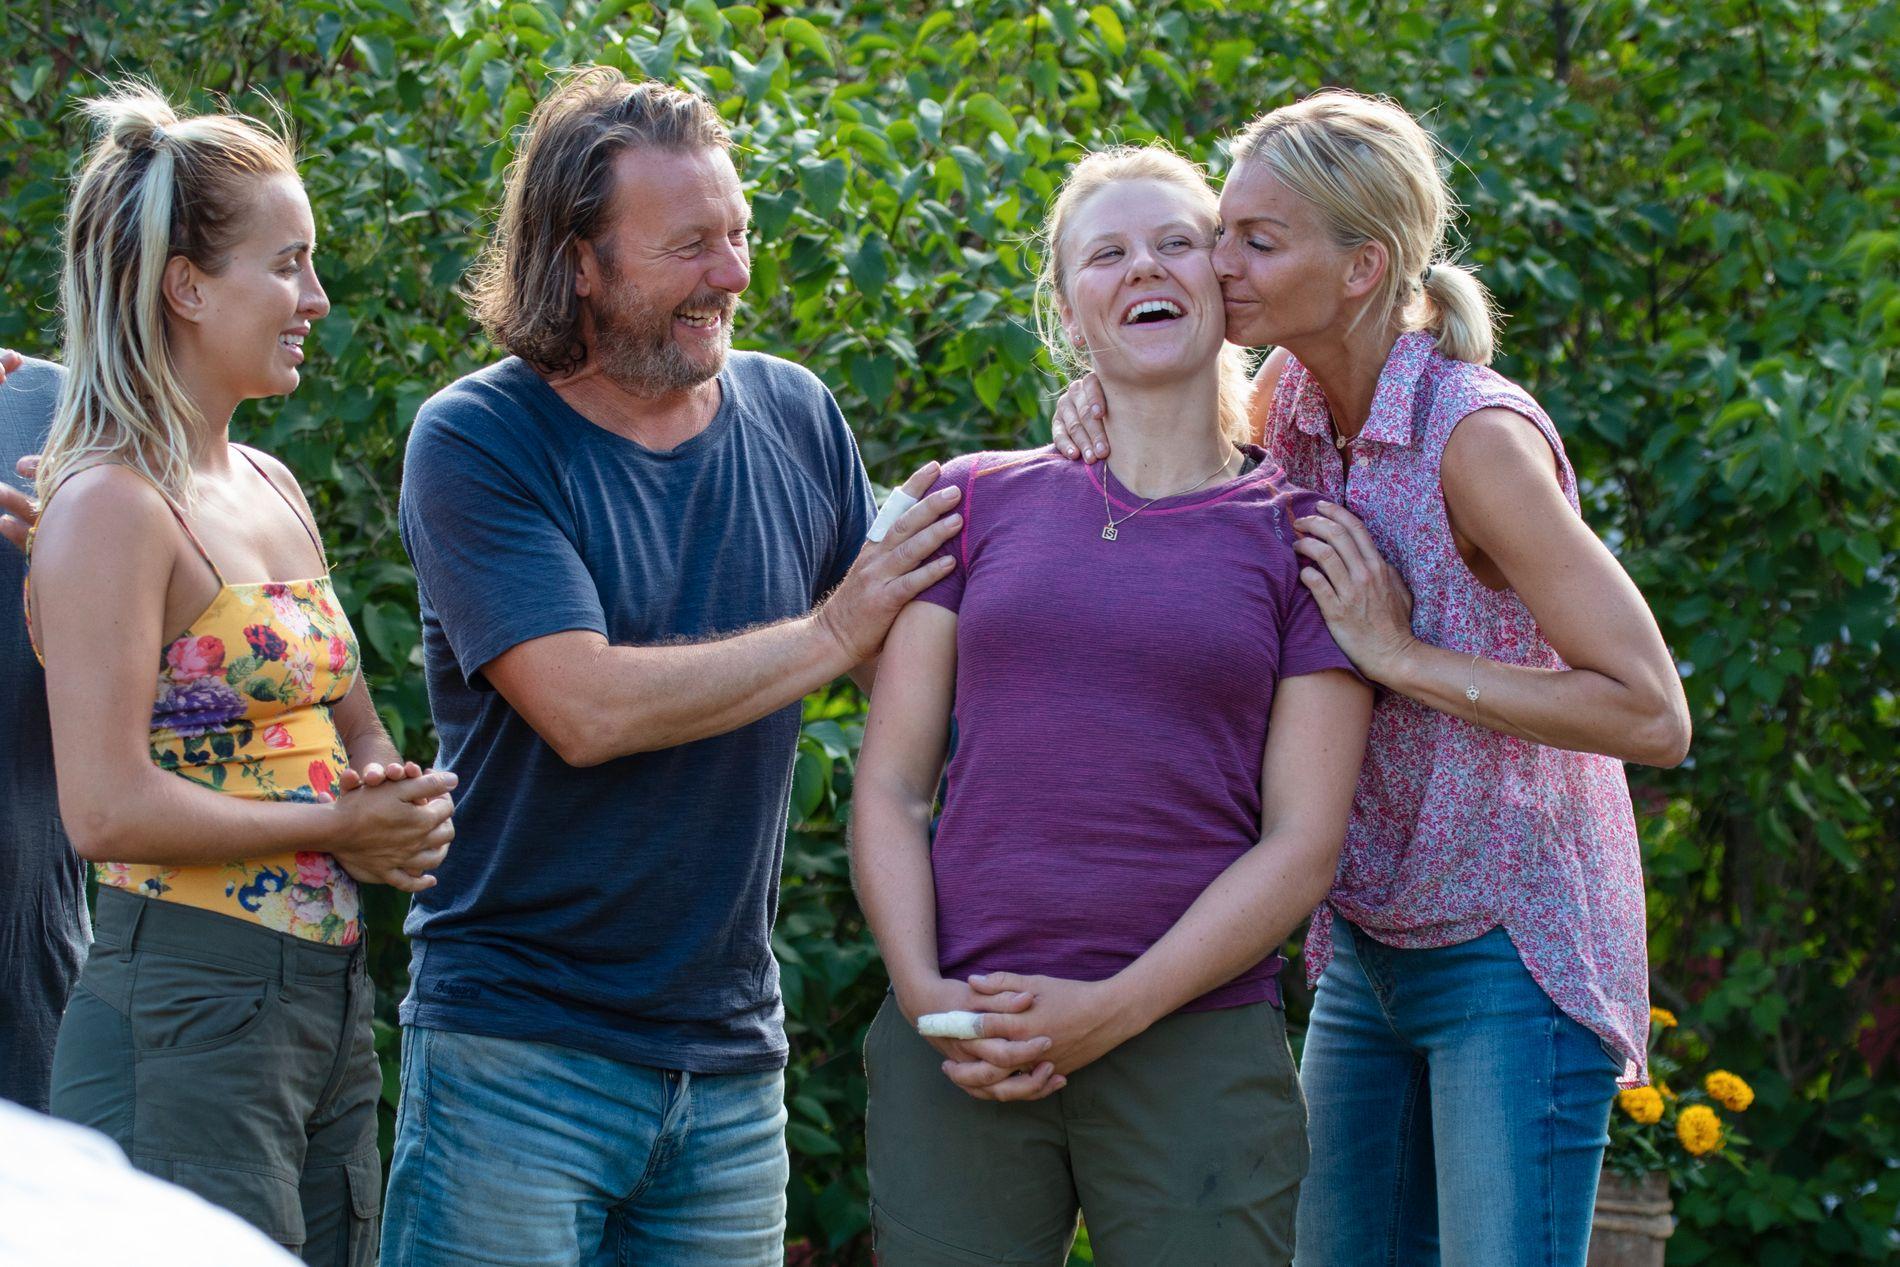 SAMMENSVEISET: Svein Østvik kom godt overens med alle på gården, her med (f.v.) Carina Dahl, Tiril Sjåstad Christiansen og Kathrine Sørland.